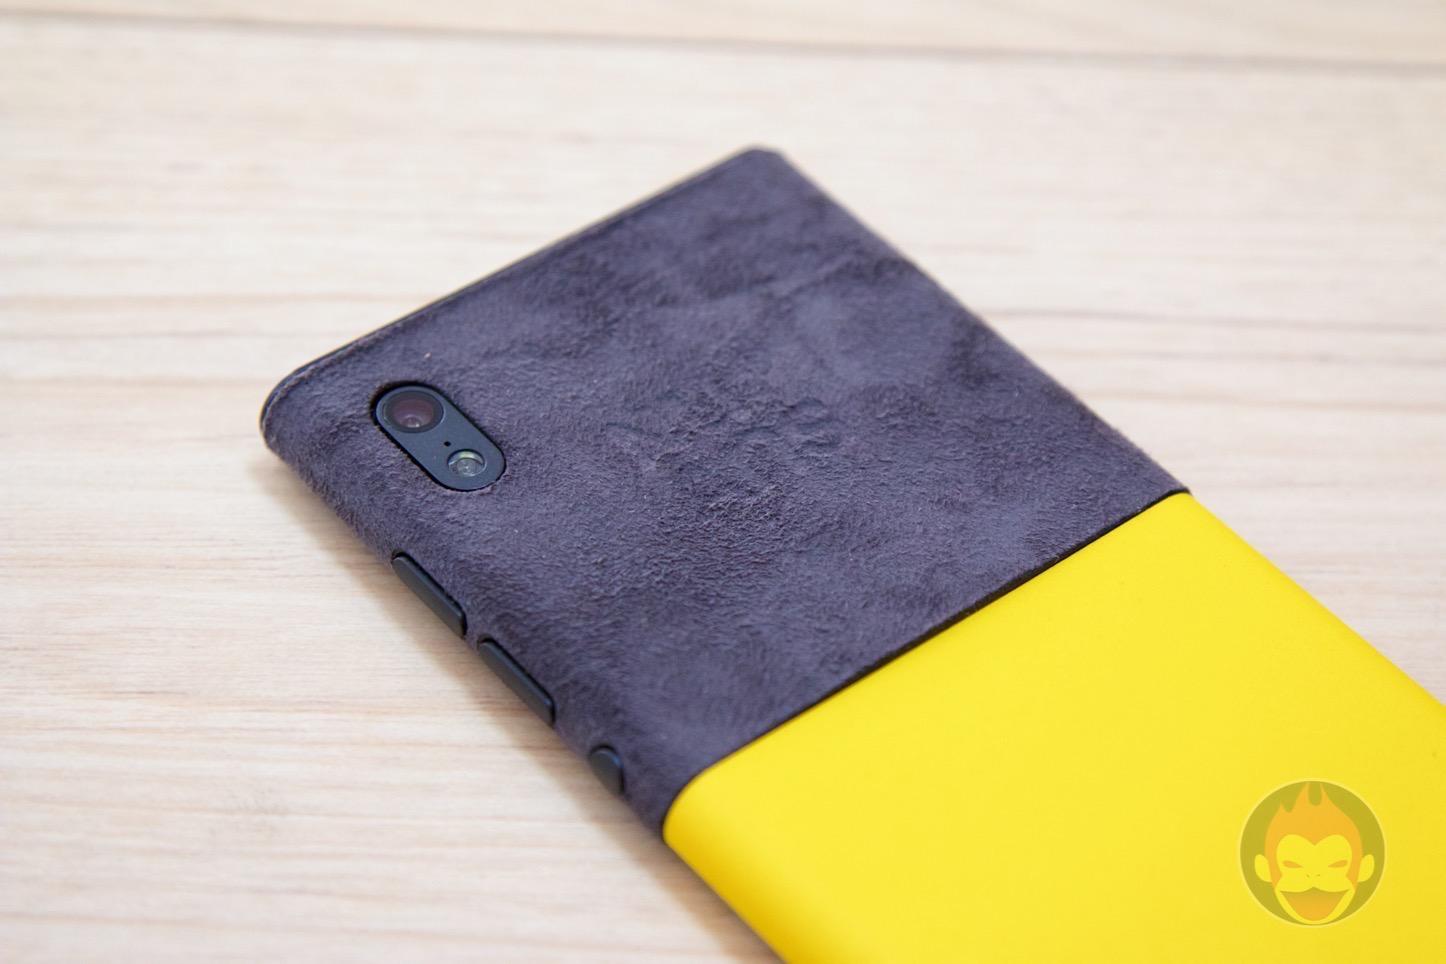 NuAns-Neo-Windows-10-Smartphone-05.jpg